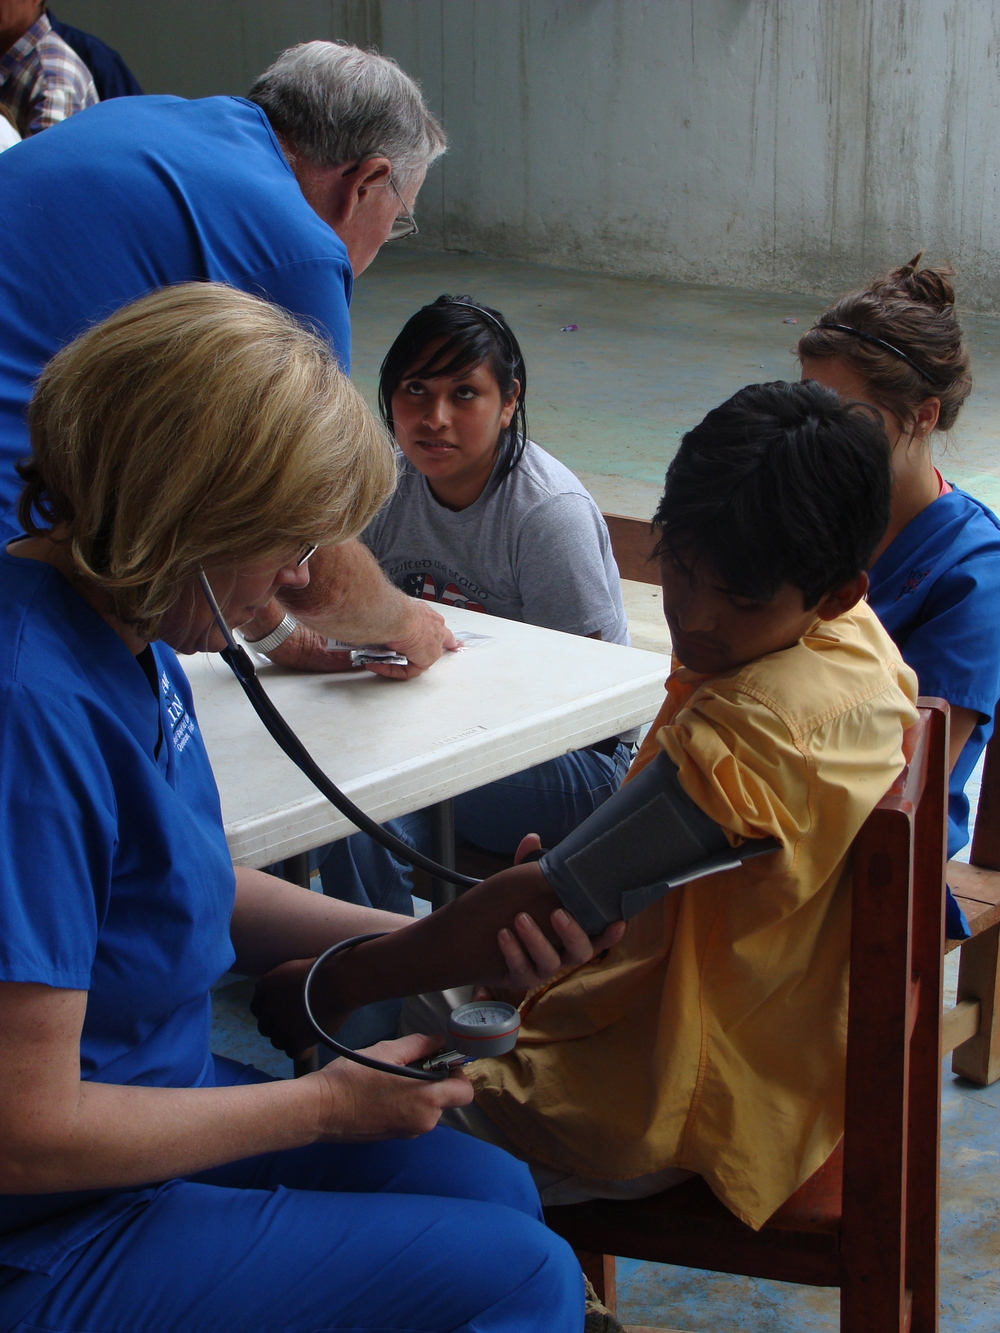 Volunteers providing healthcare check ups